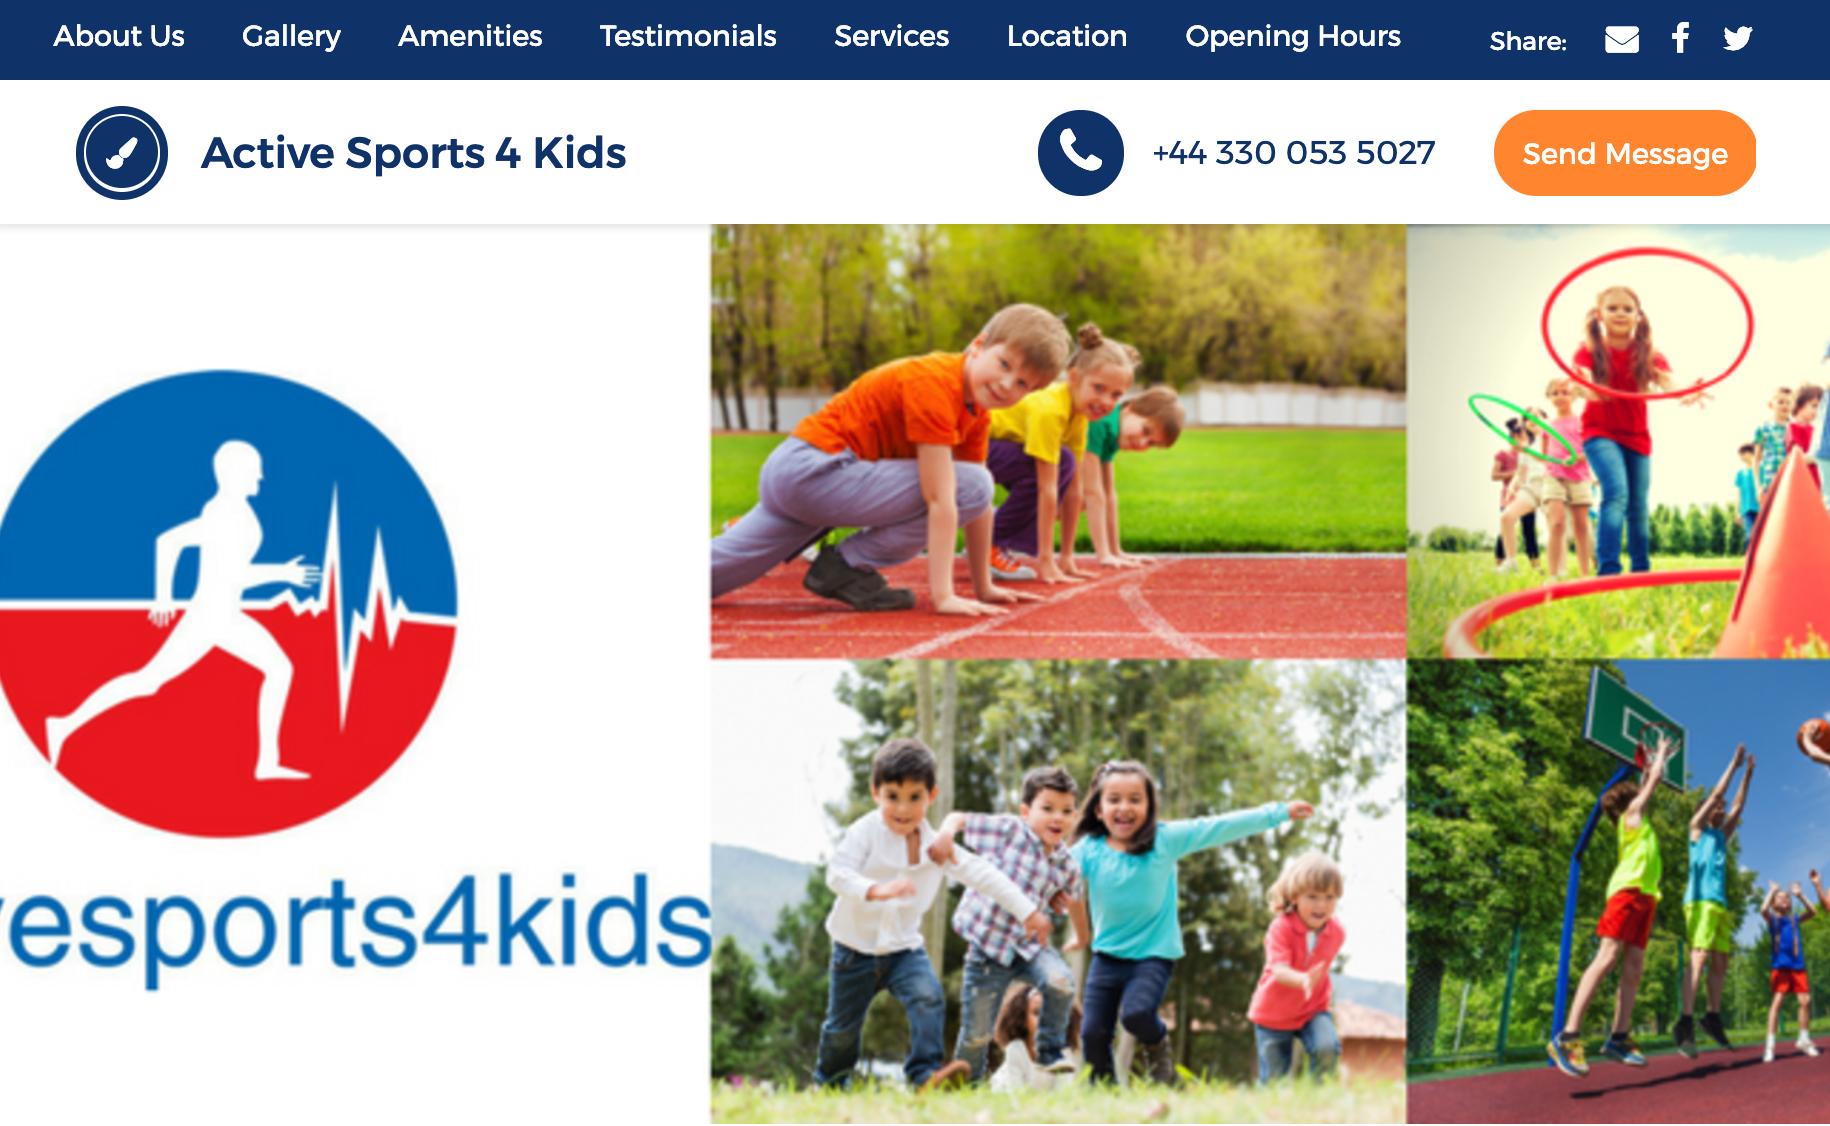 Active Sports 4 Kids